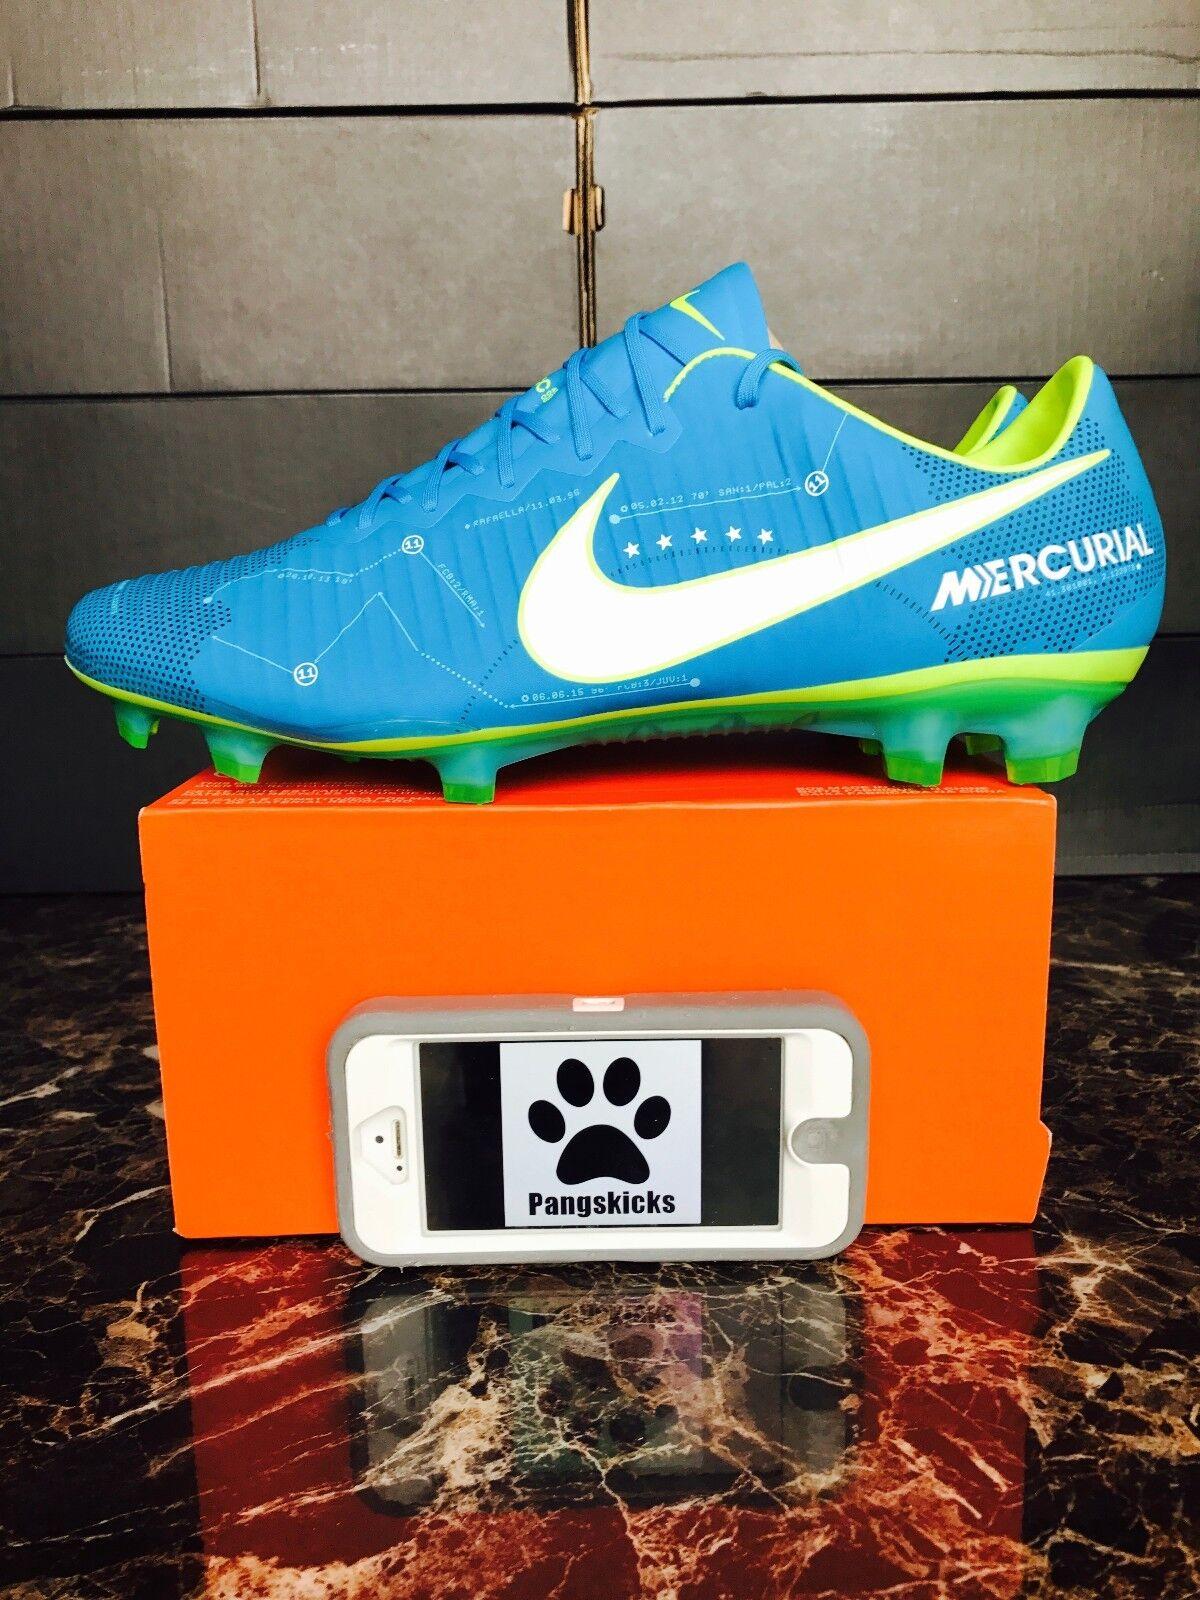 7711f62b29b0 Nike Mercurial Vapor XI Neymar FG 921547-400 Blue Orbit Soccer ...